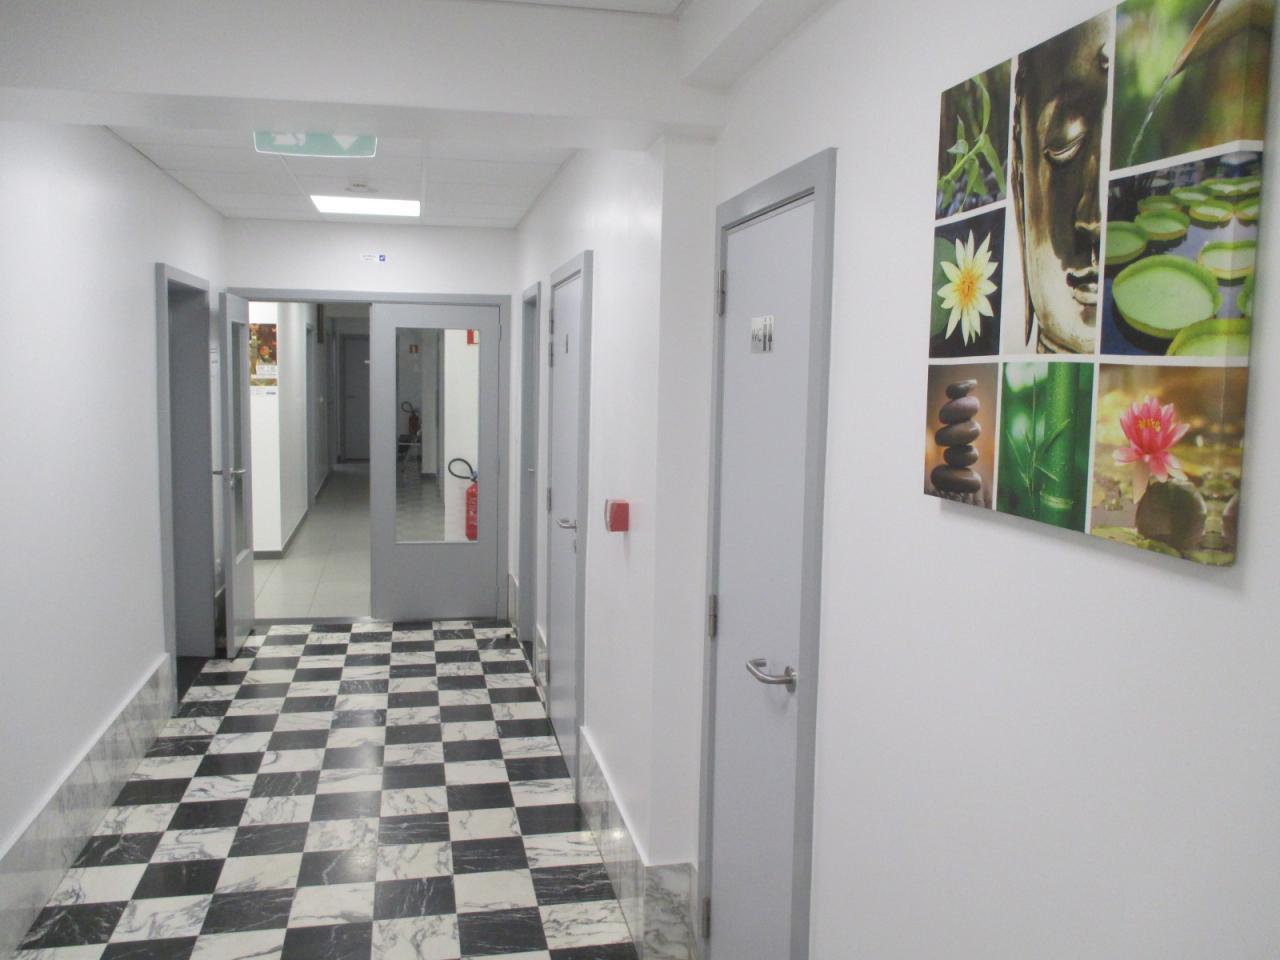 Maison Médicale Humilis : hall